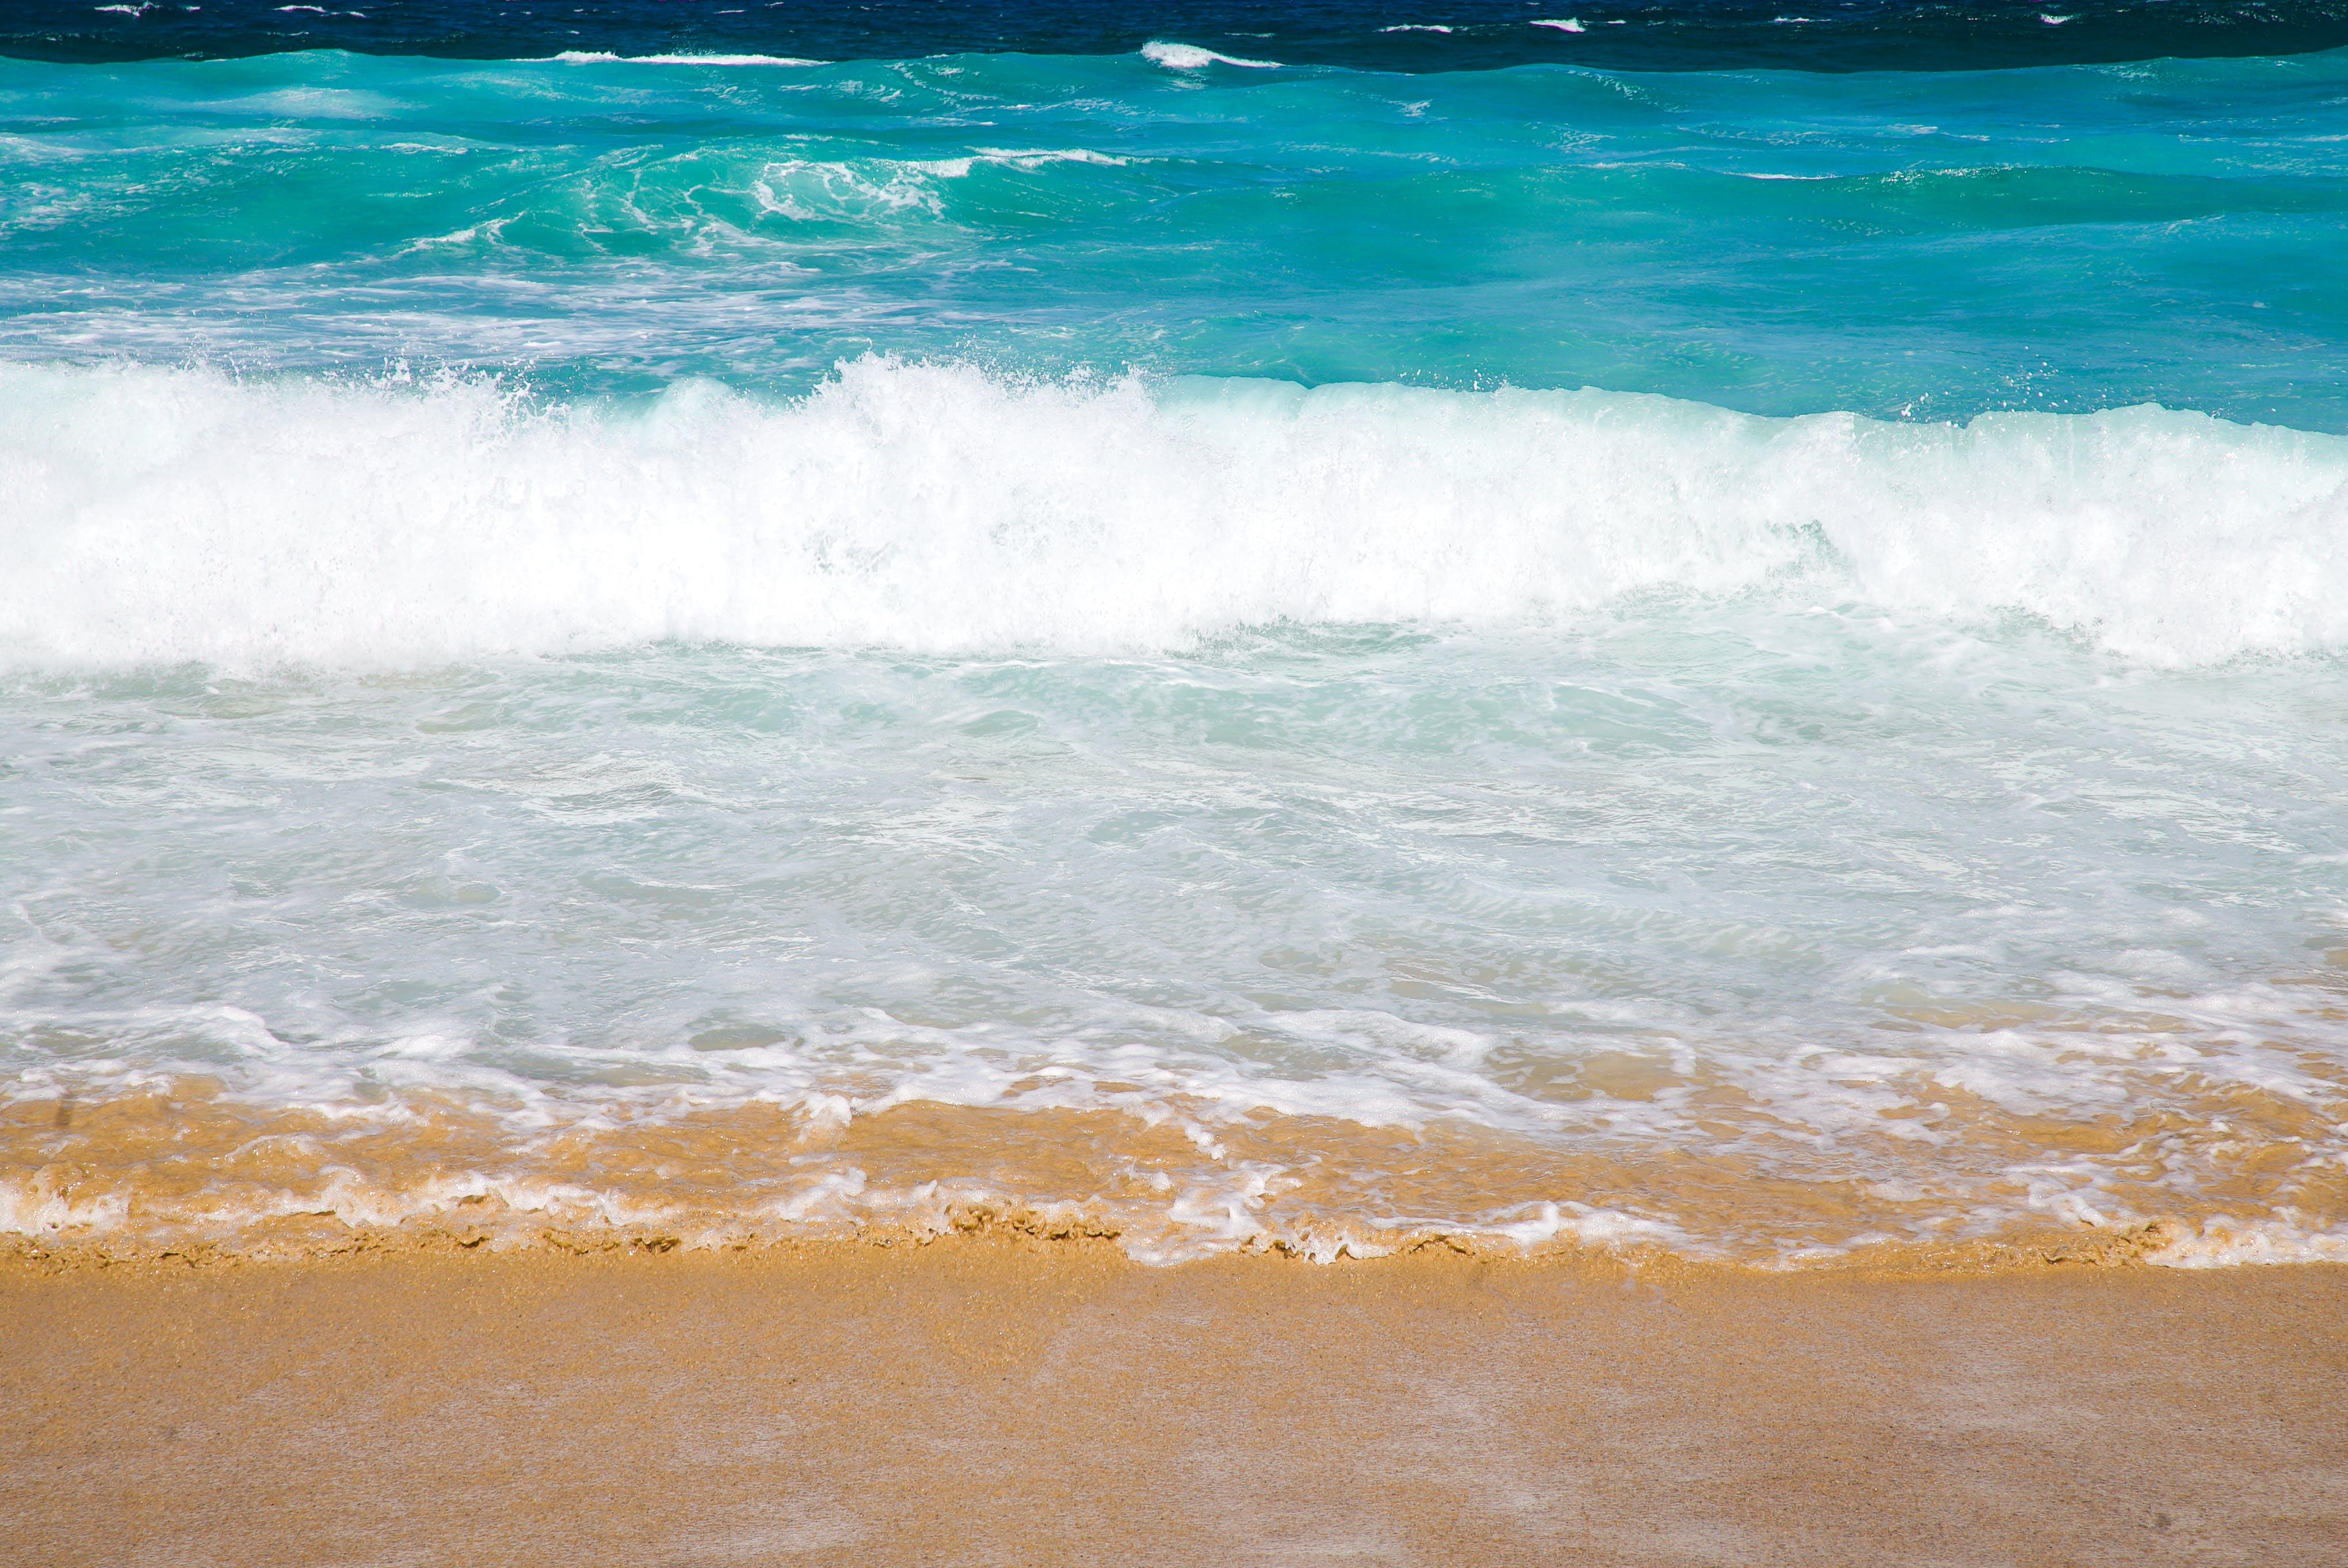 Seashore and Green Sea Water